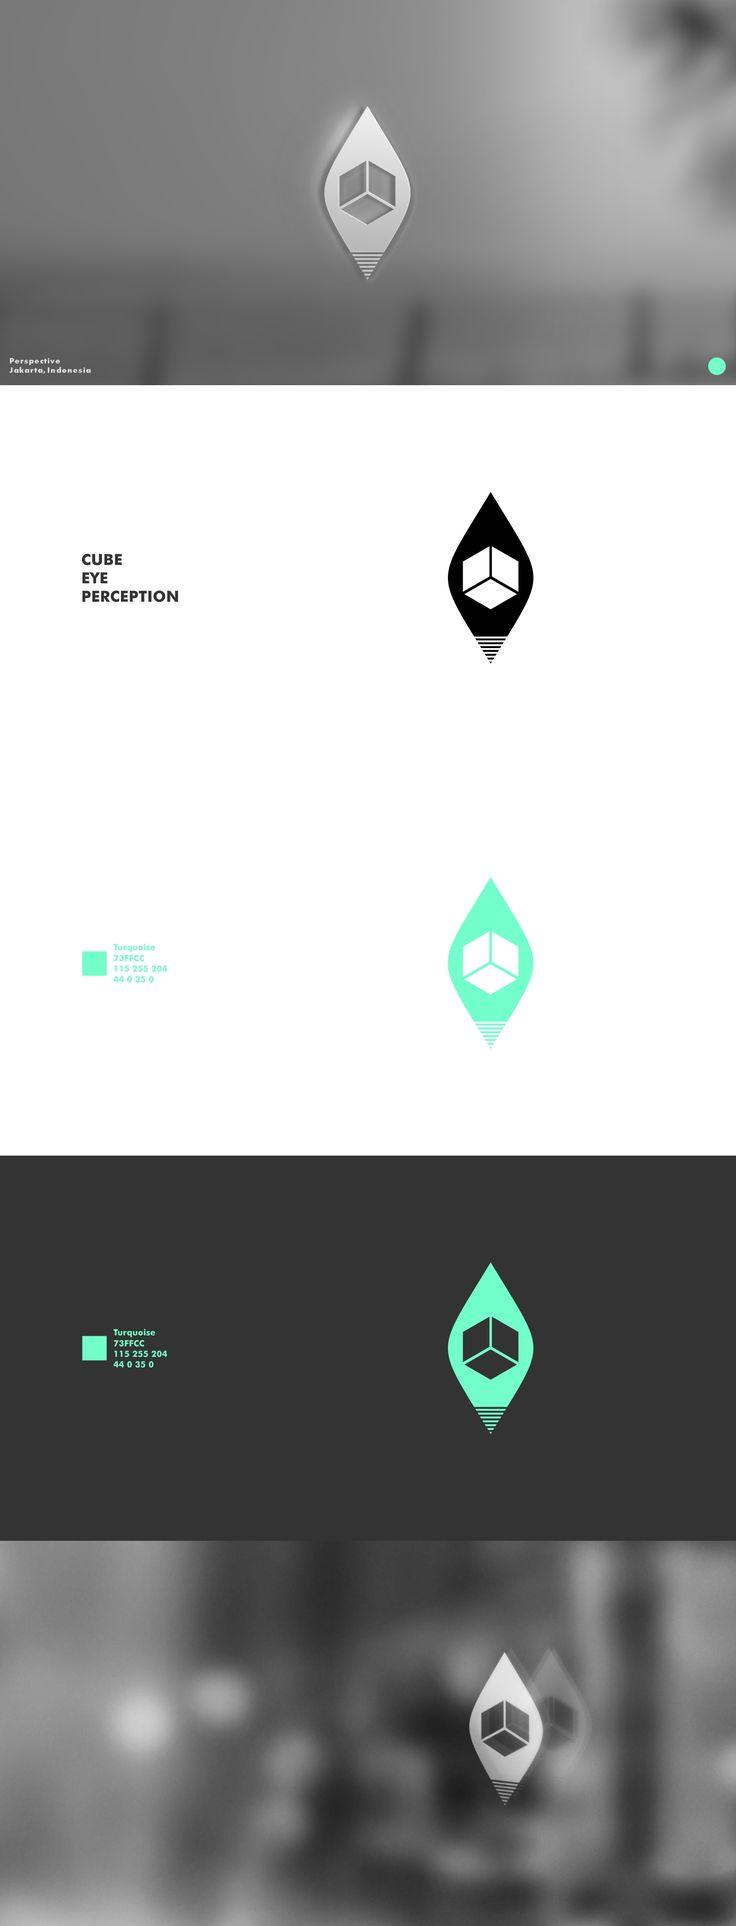 Perspective - Visual Identity #visual #identity #visualidentity #logo #graphic #design #graphicdesign #digitalart #presentation #portfolio